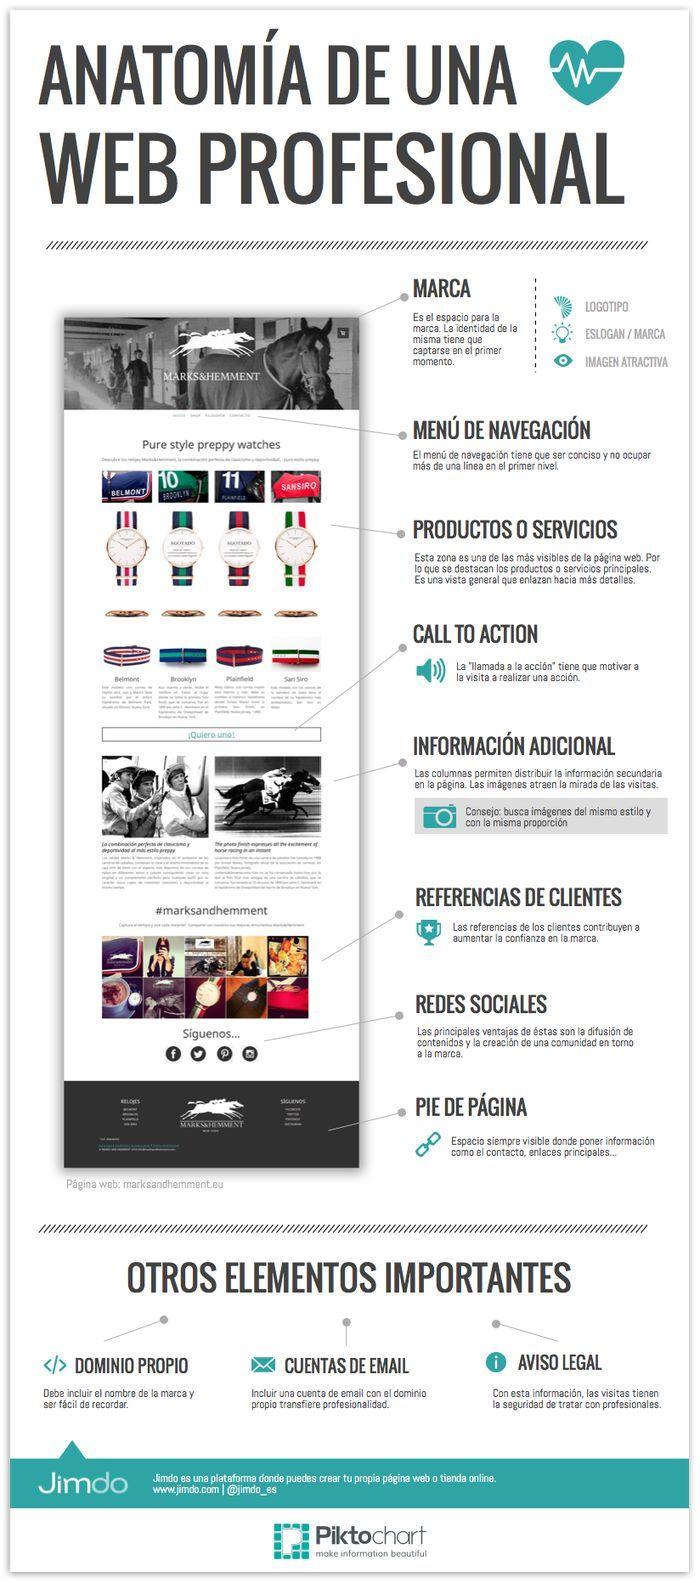 Anatomía de una web profesional #infografia #infographic